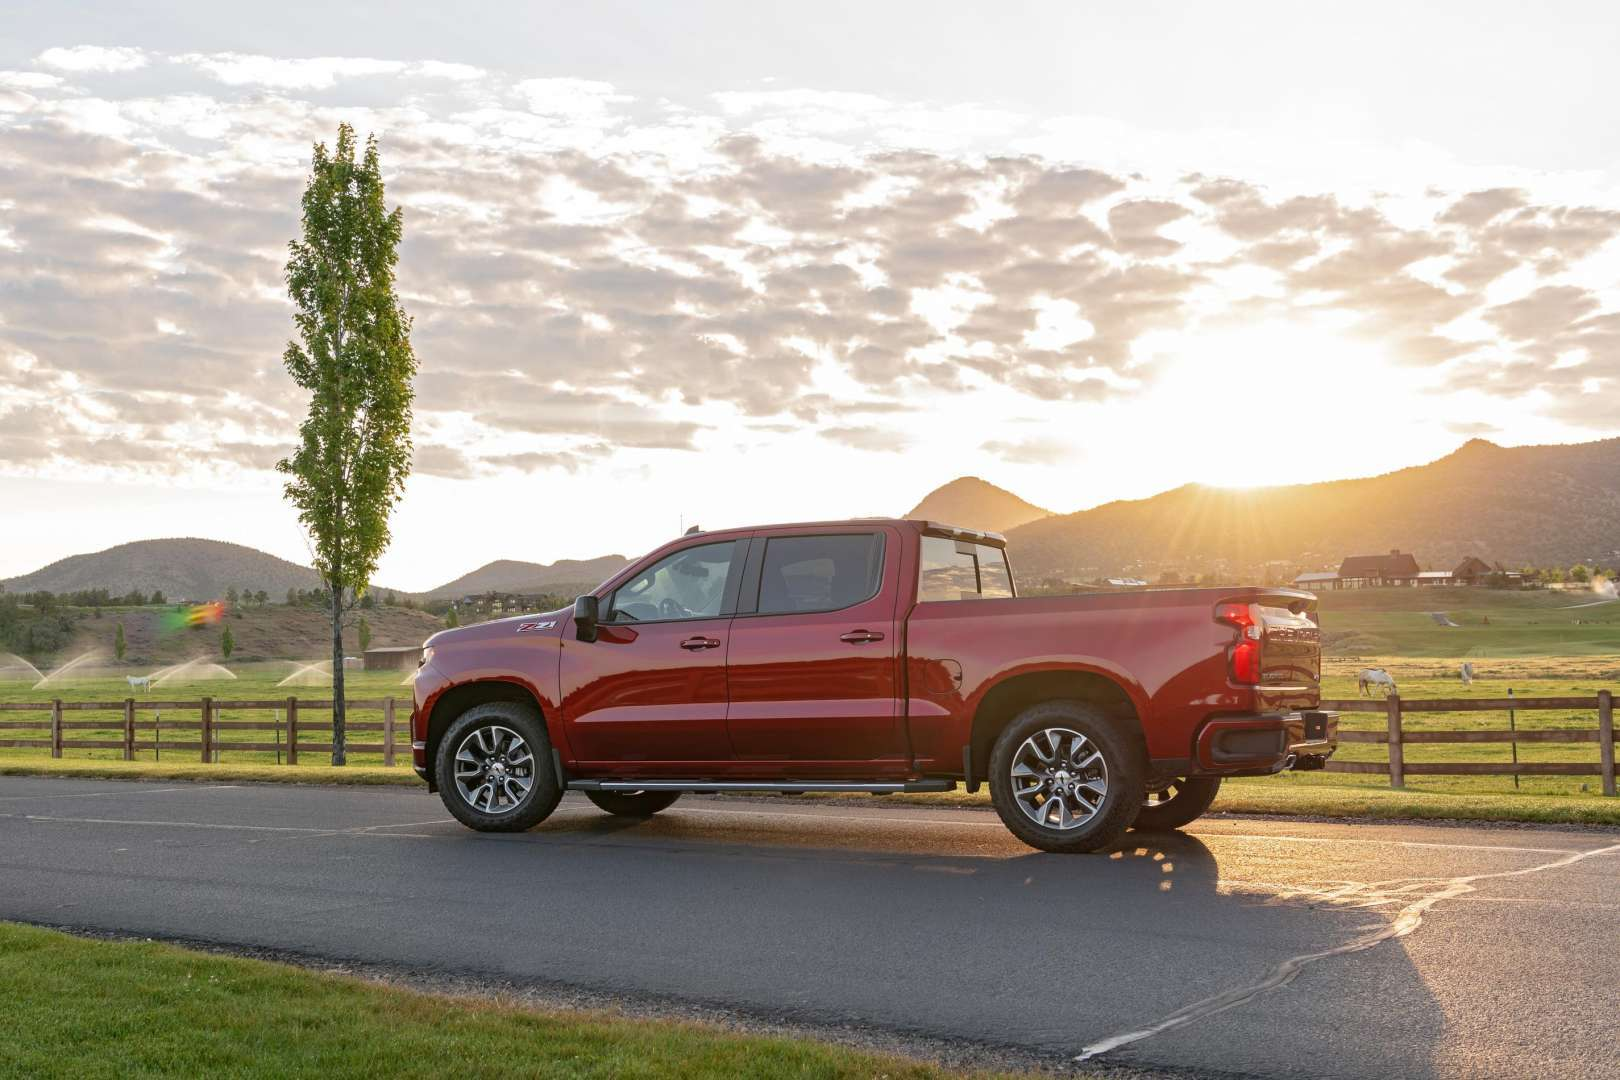 The 2020 Chevrolet Silverado 3.0L Duramax diesel achieves 33 mpg on the highway - dlmag